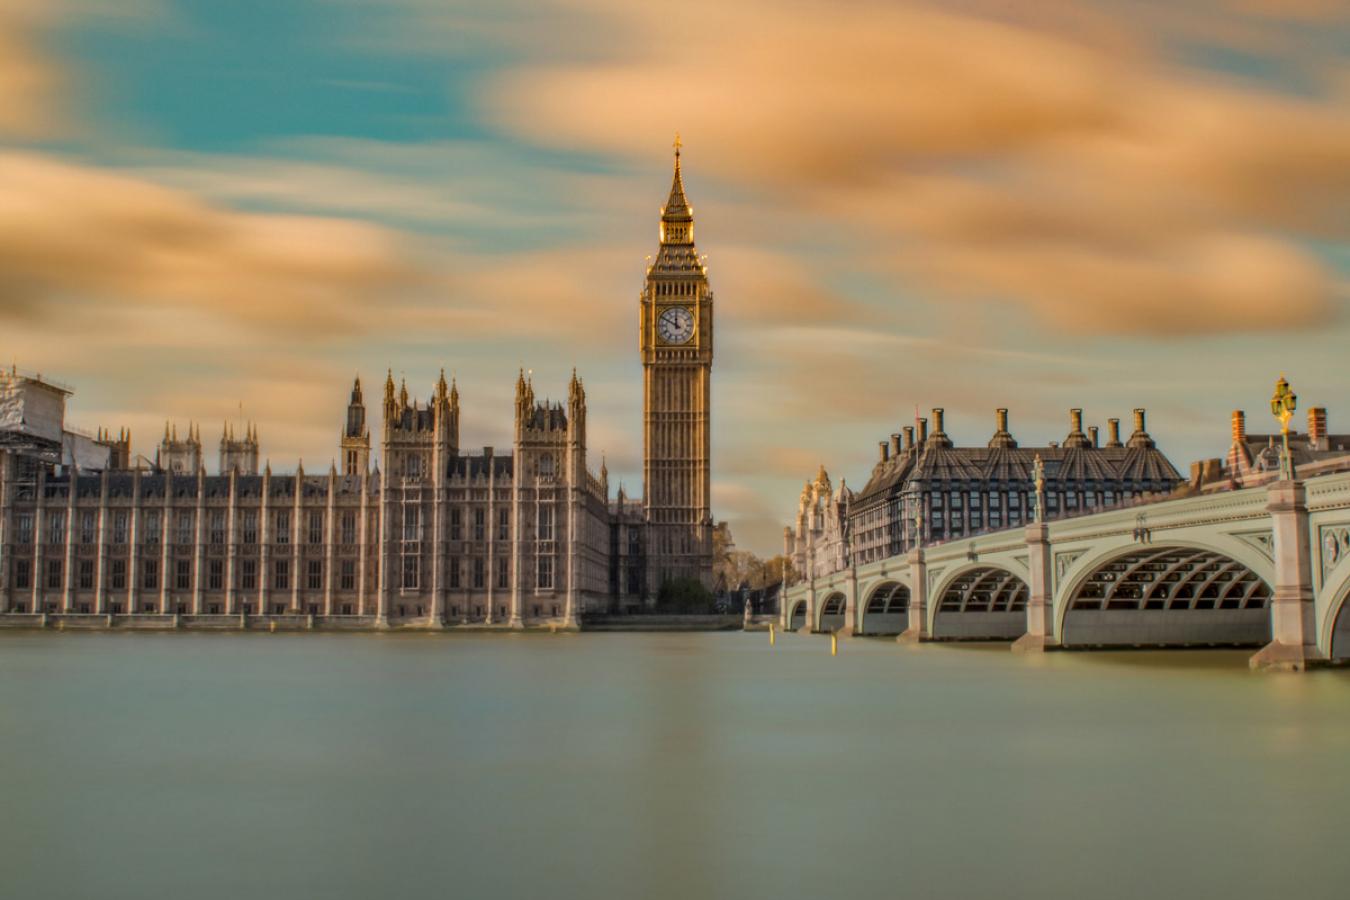 House of Parliament, London, UK